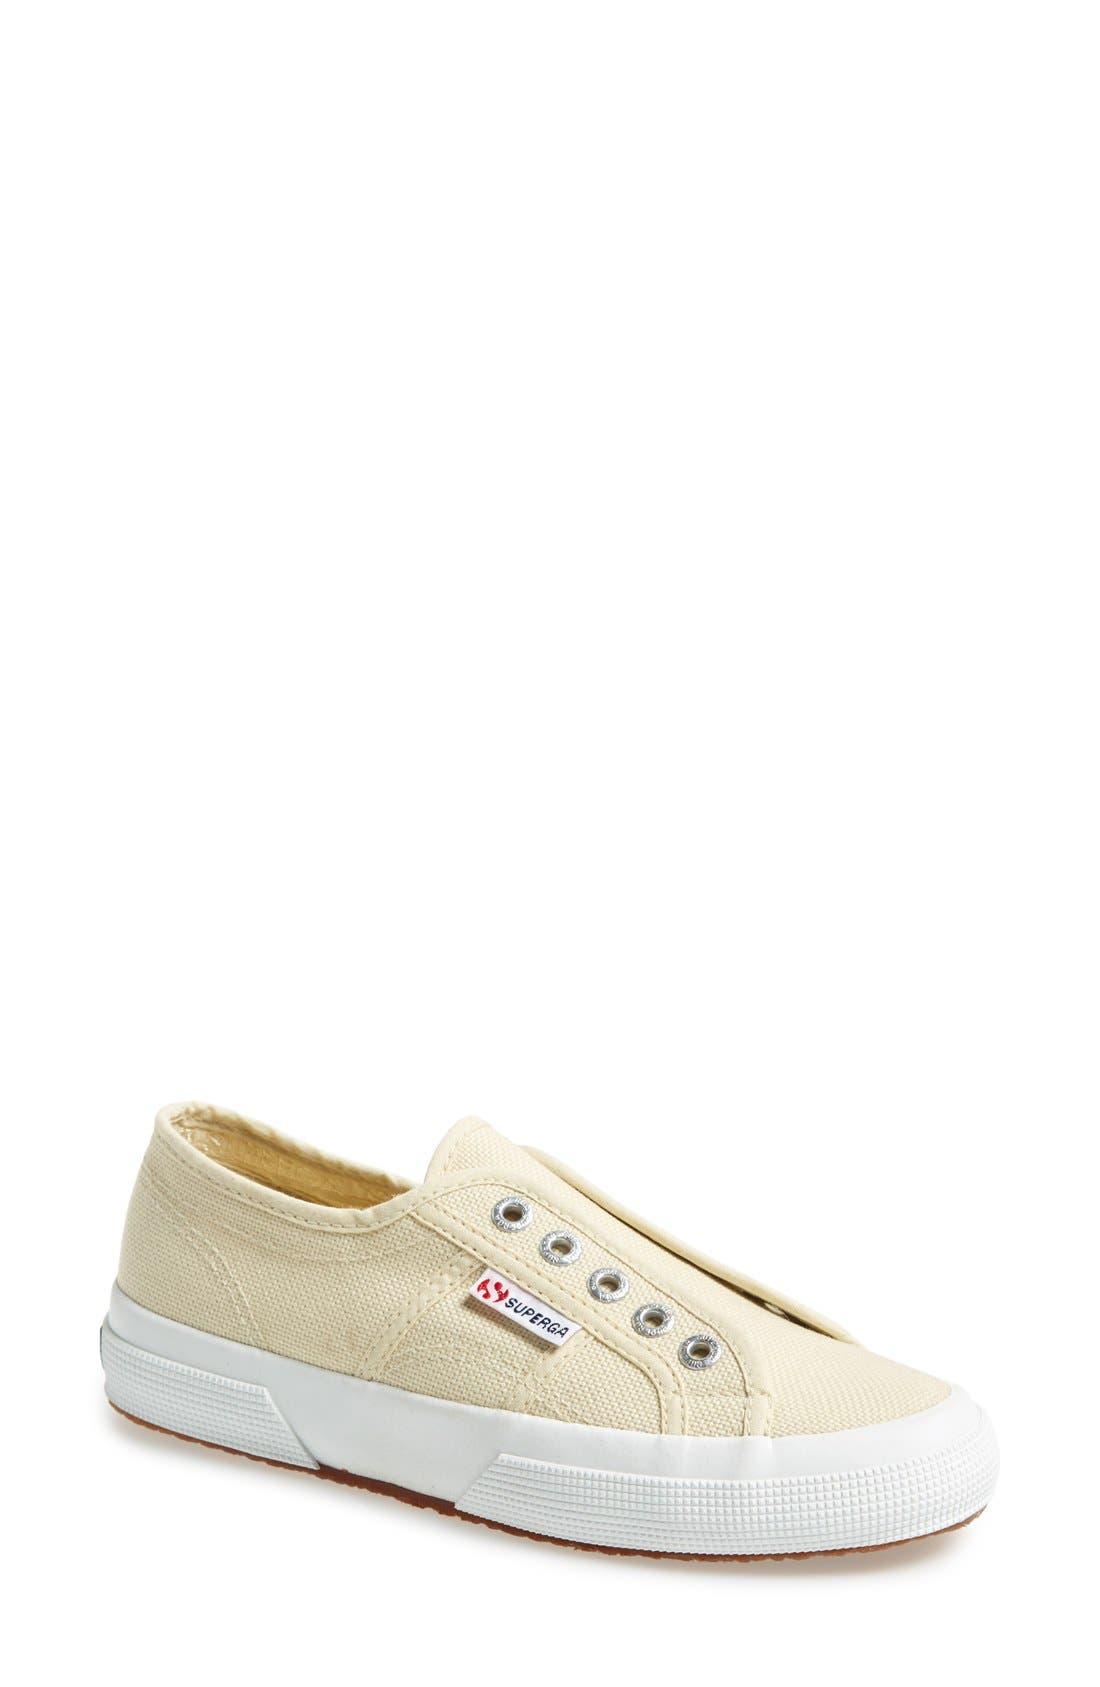 Alternate Image 1 Selected - Superga 'Cotu' Slip-On Sneaker (Women)